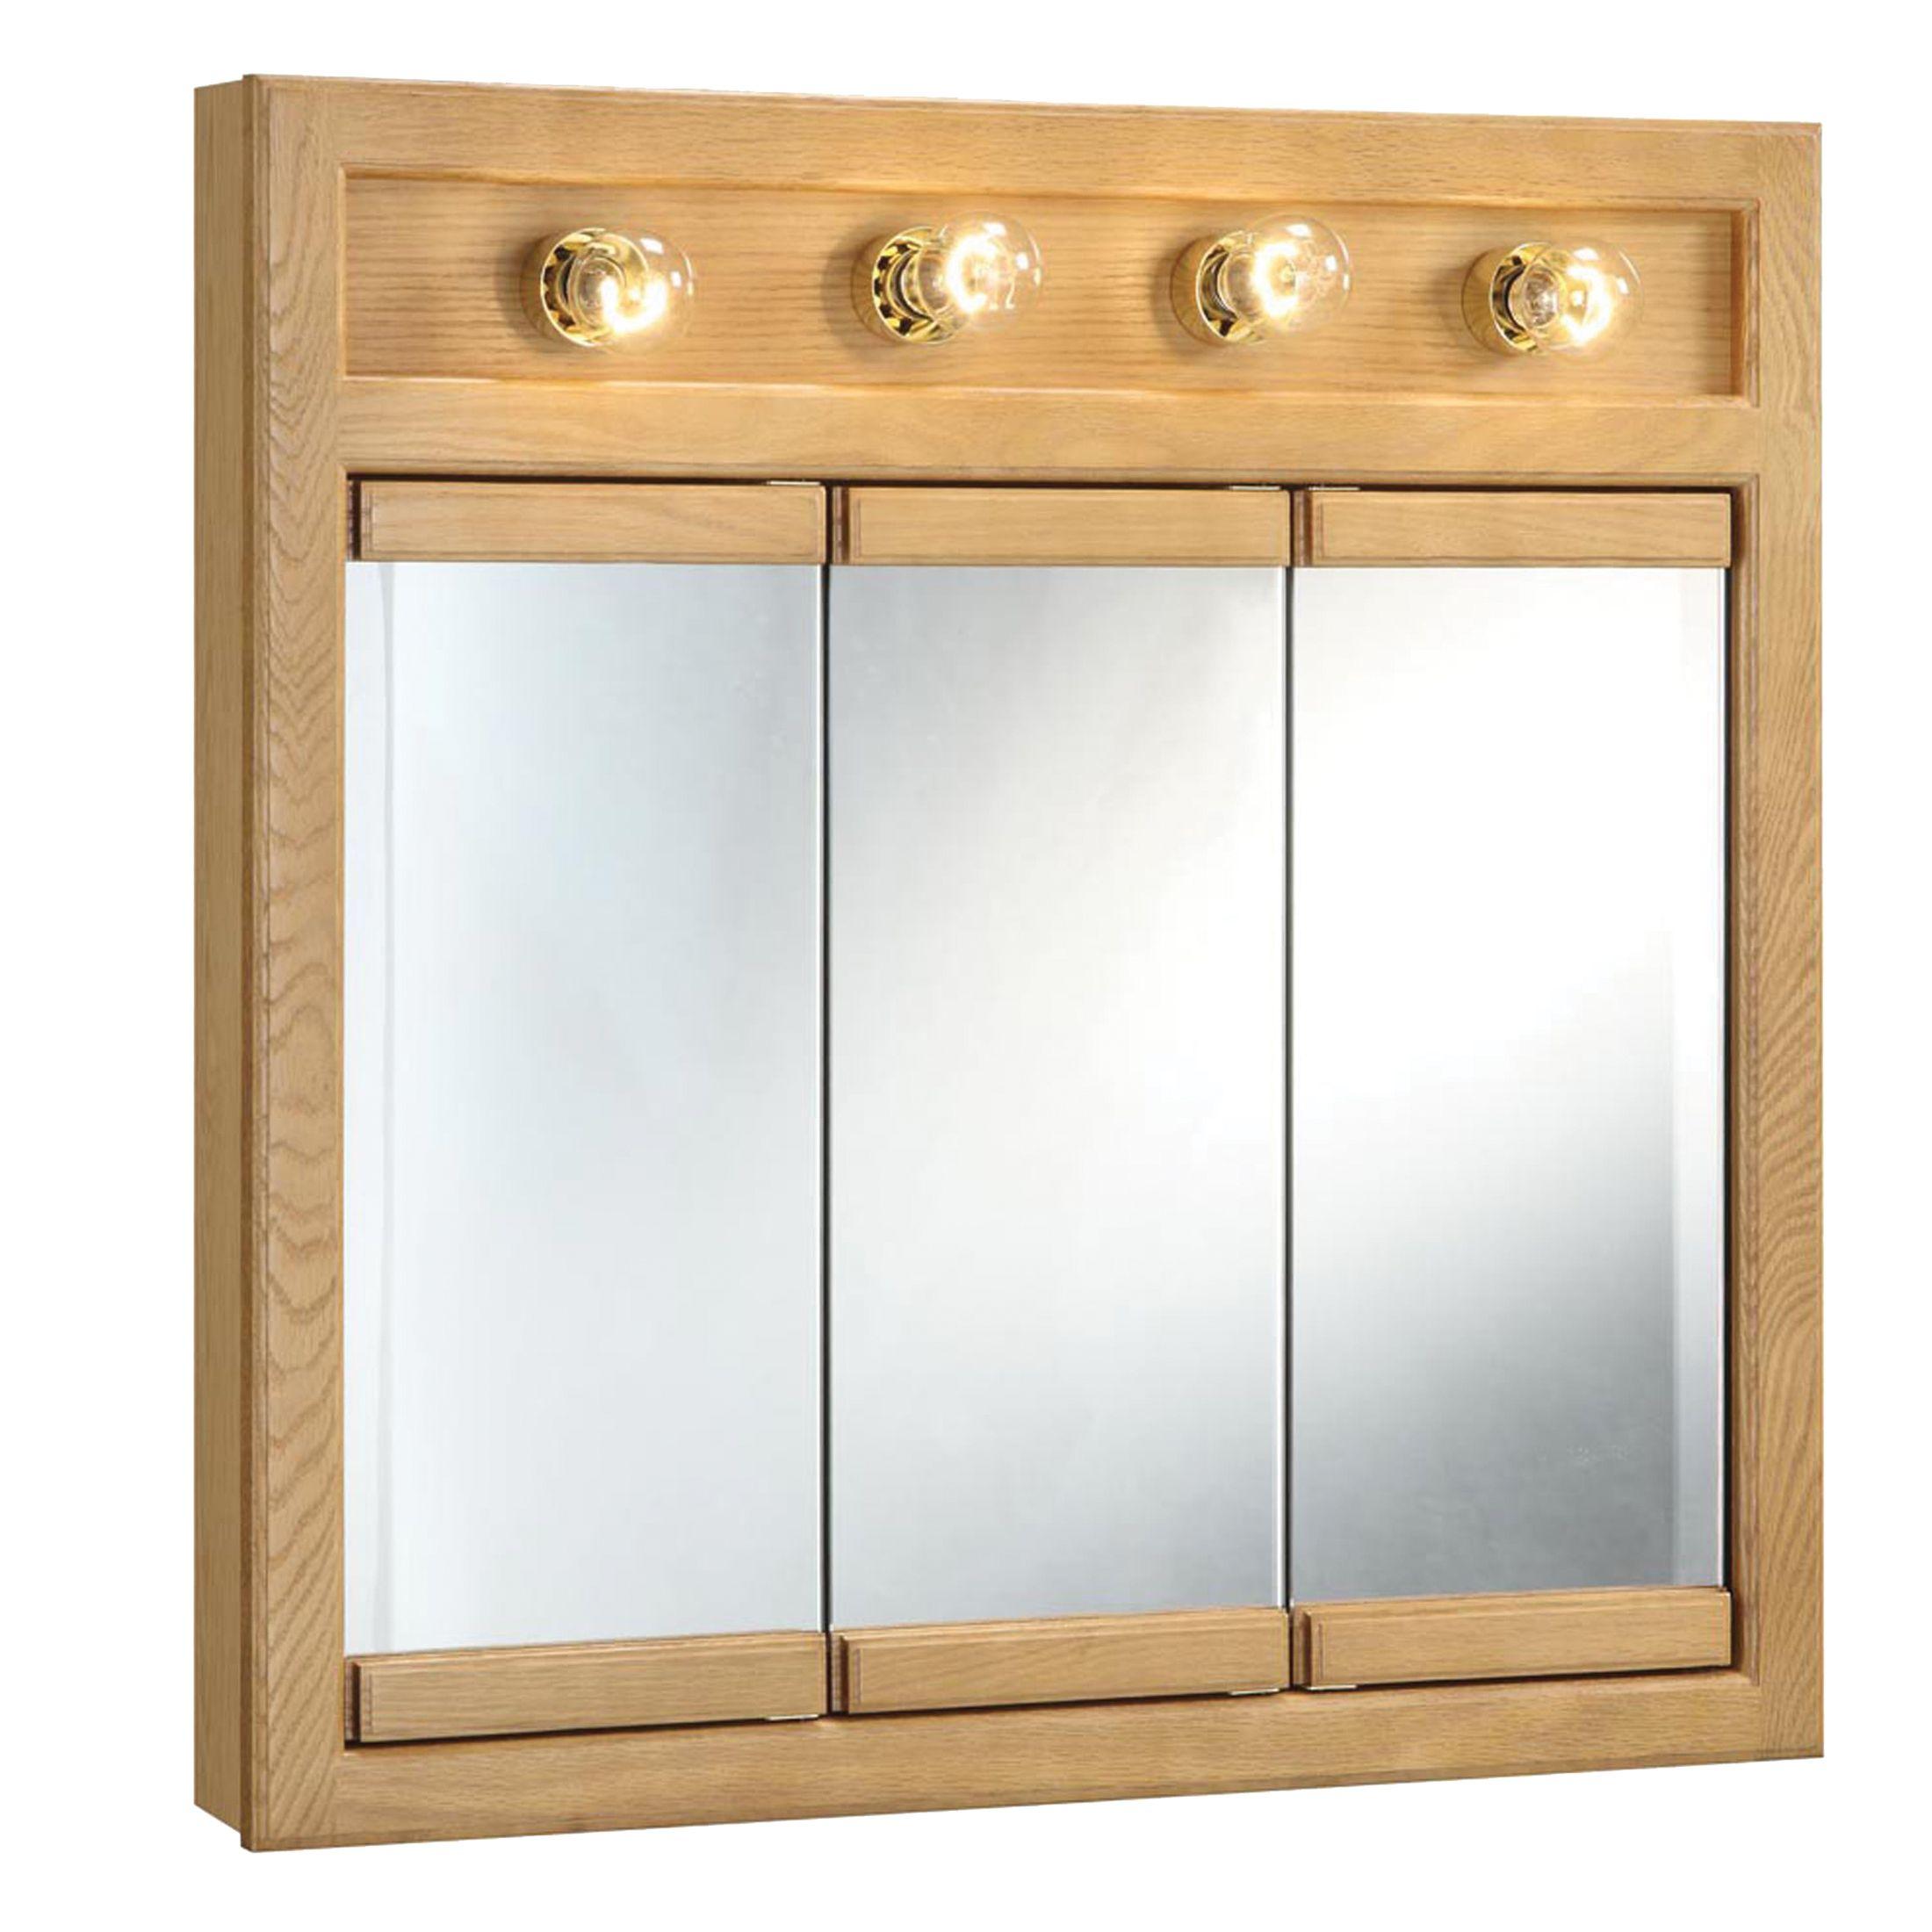 "Richland 4-Light Tri-View Wall Cabinet 30"", Nutmeg Oak #530600"